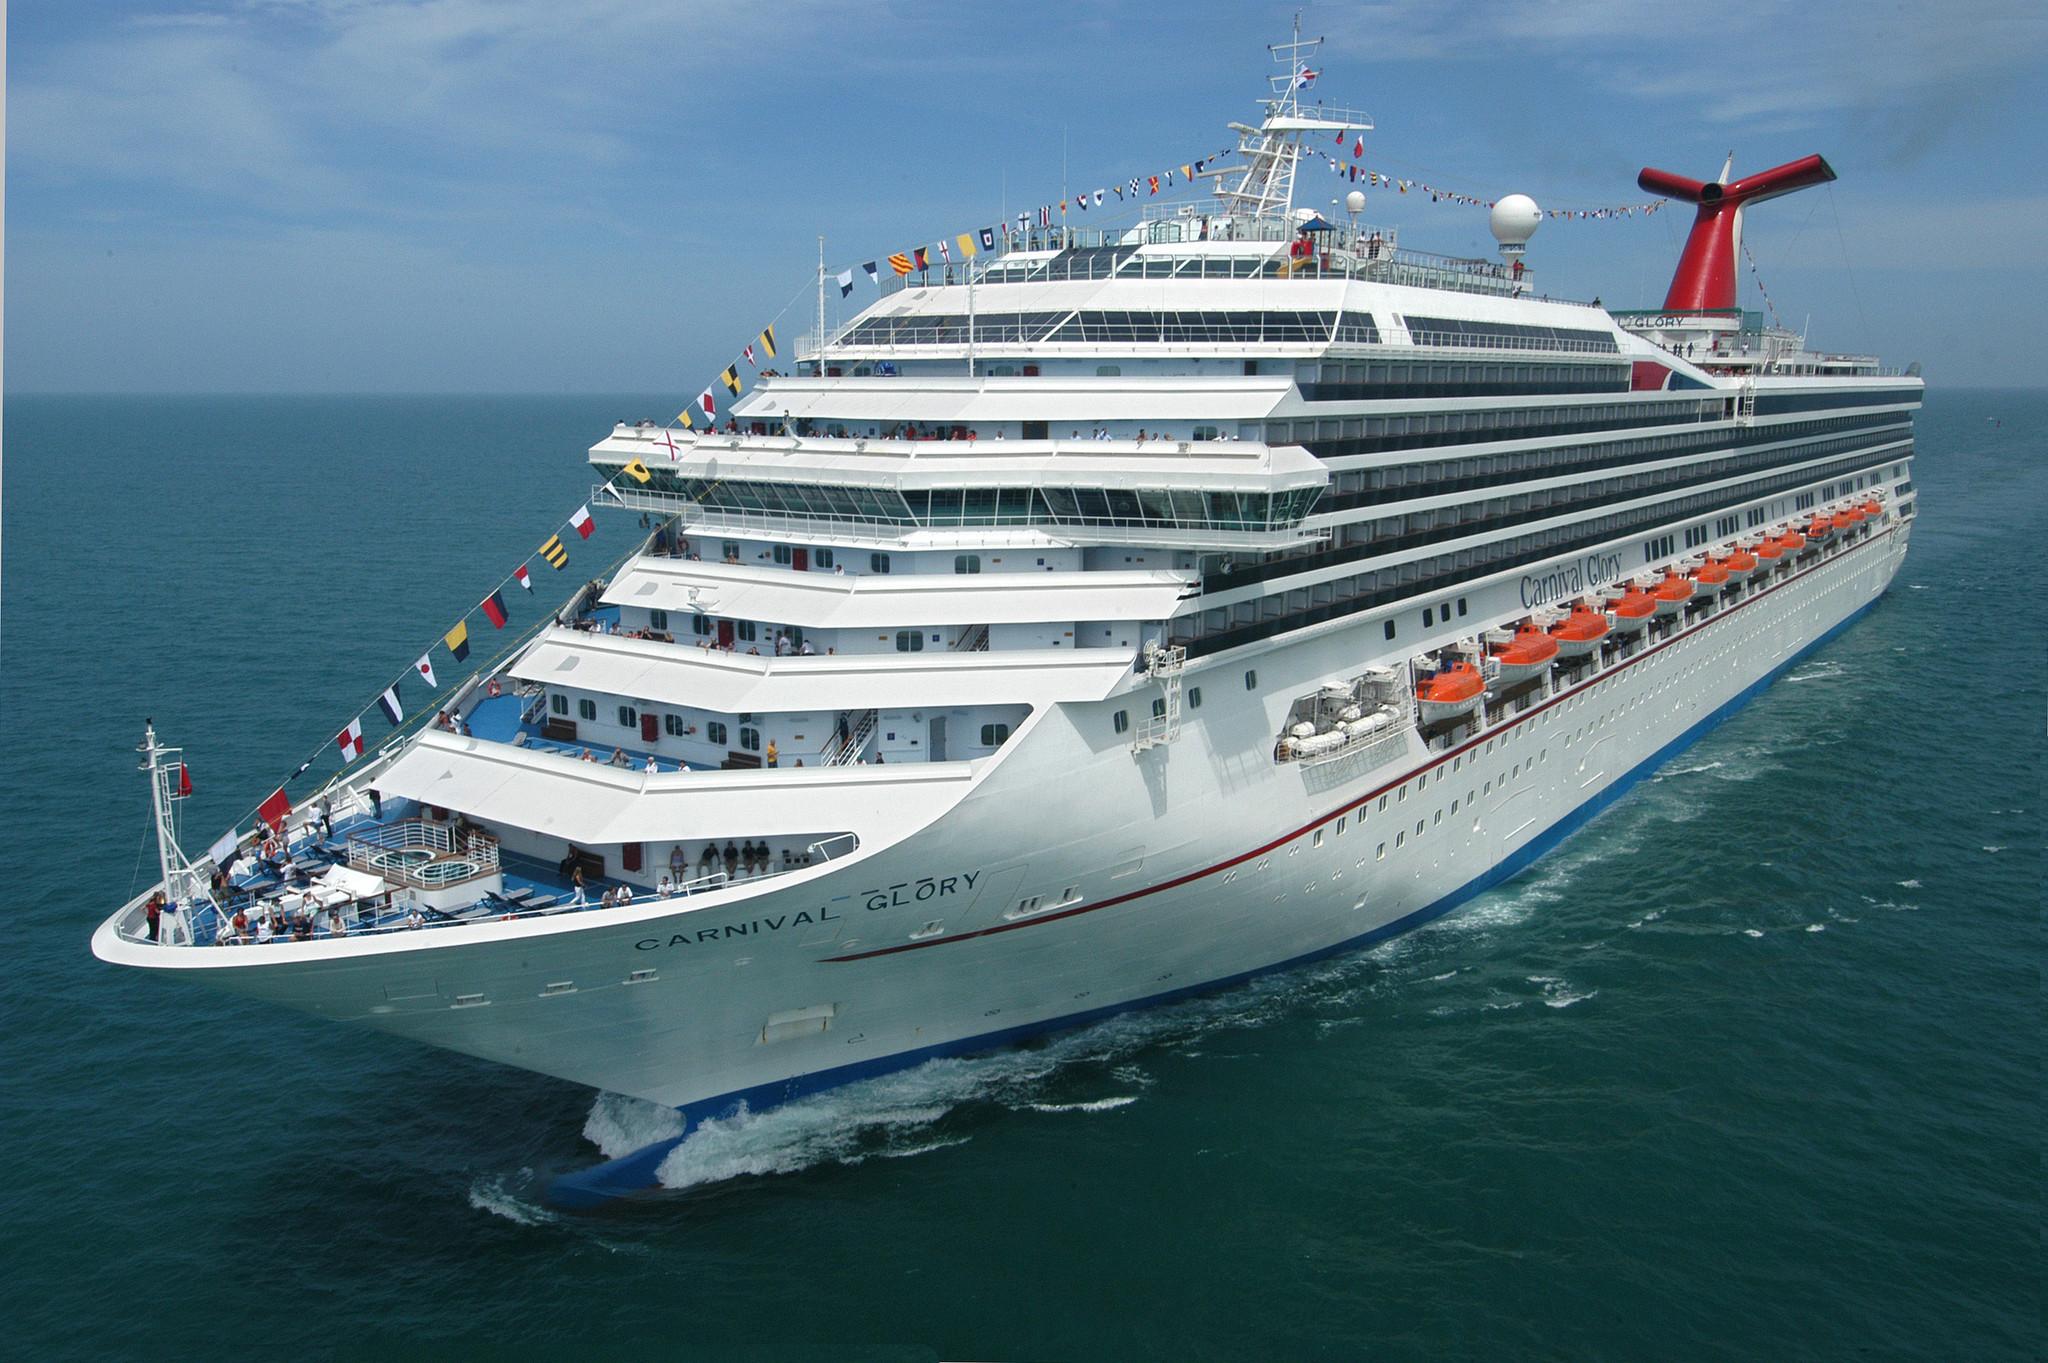 Girl's Fatal Fall Aboard Cruise Ship In Miami Raises